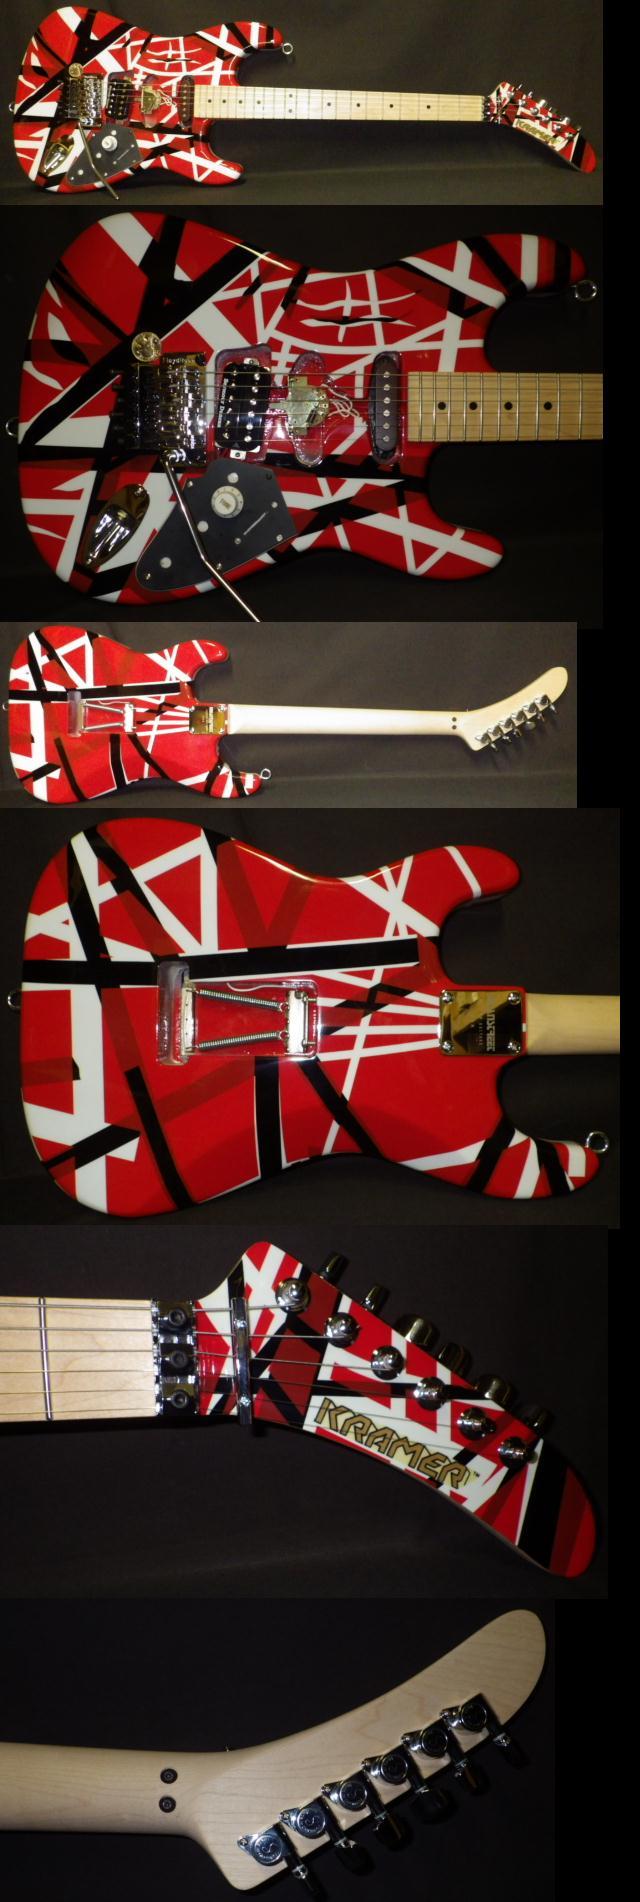 Mean Street Tour Model Franky Glossy Corey B.jpg